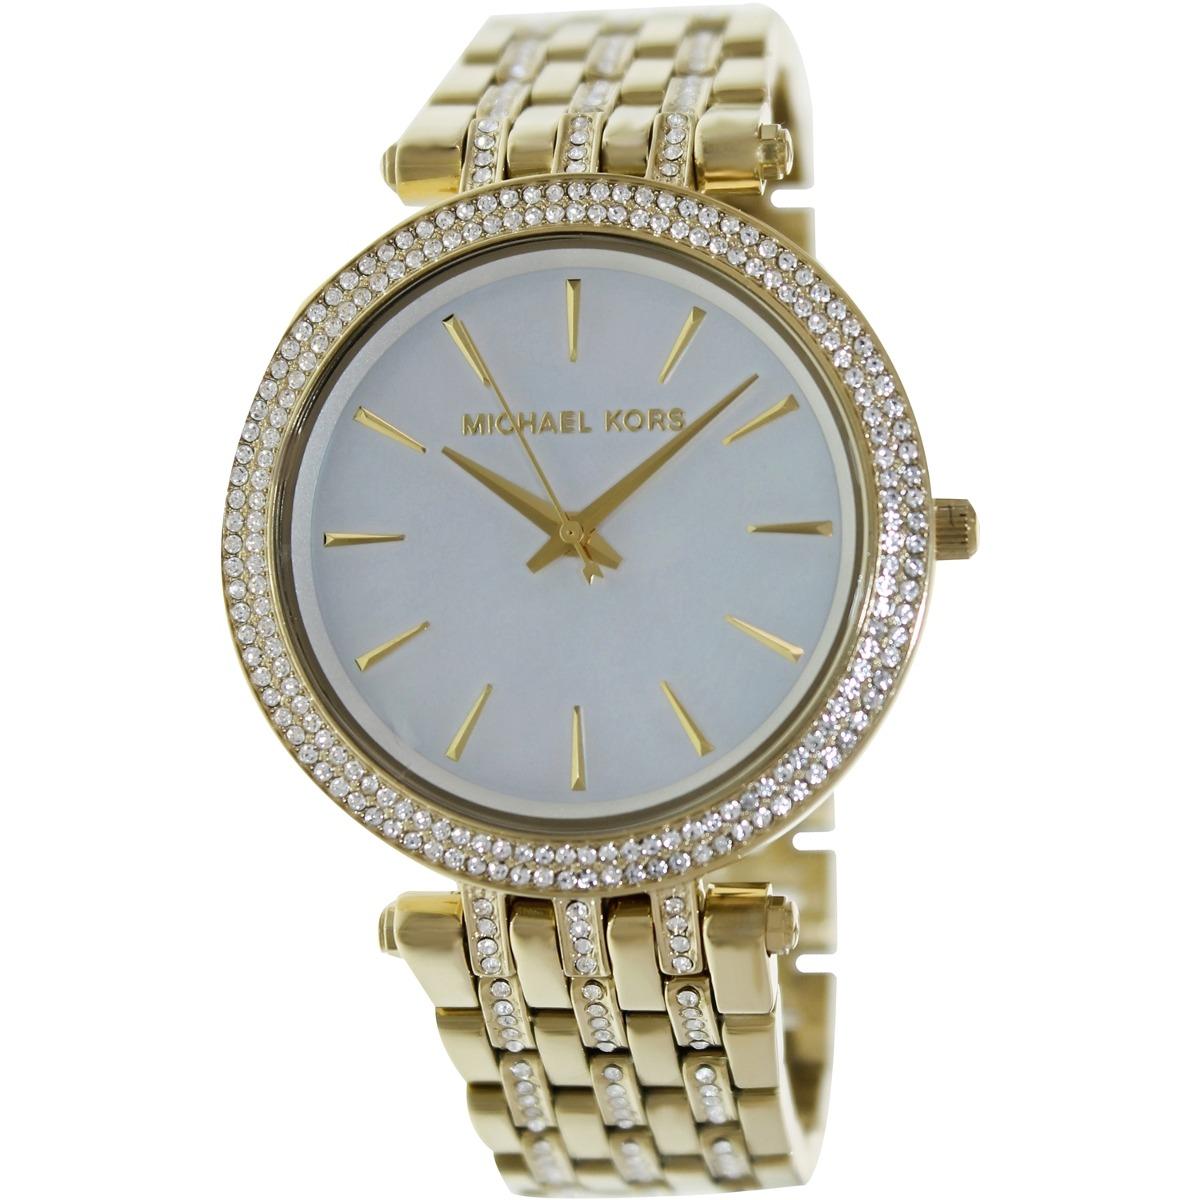 Mk3219 Para Reloj Mujer Nácar Kors Darci Michael DWEH9I2